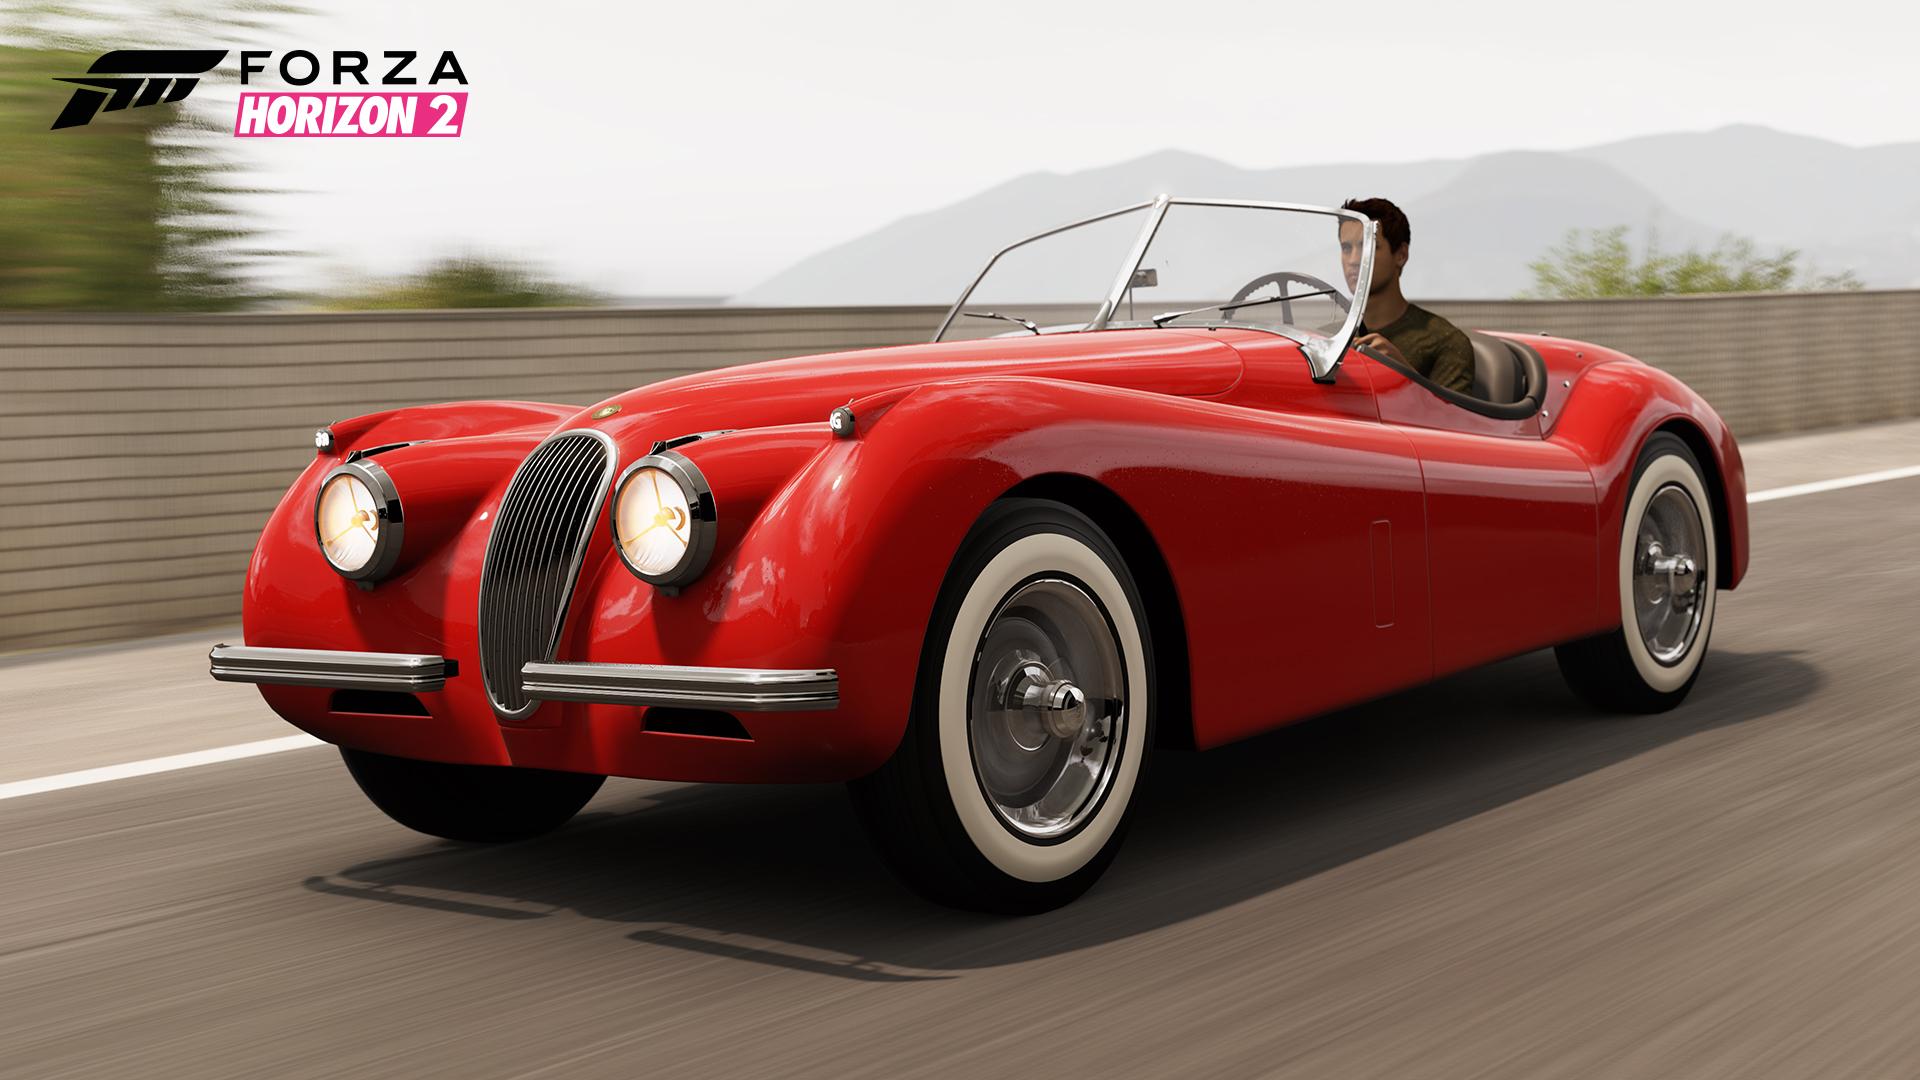 Revelados os primeiros 100 carros para Forza Horizon 2 JaguarXK120_WM_CarReveal_Week1_ForzaHorizon2